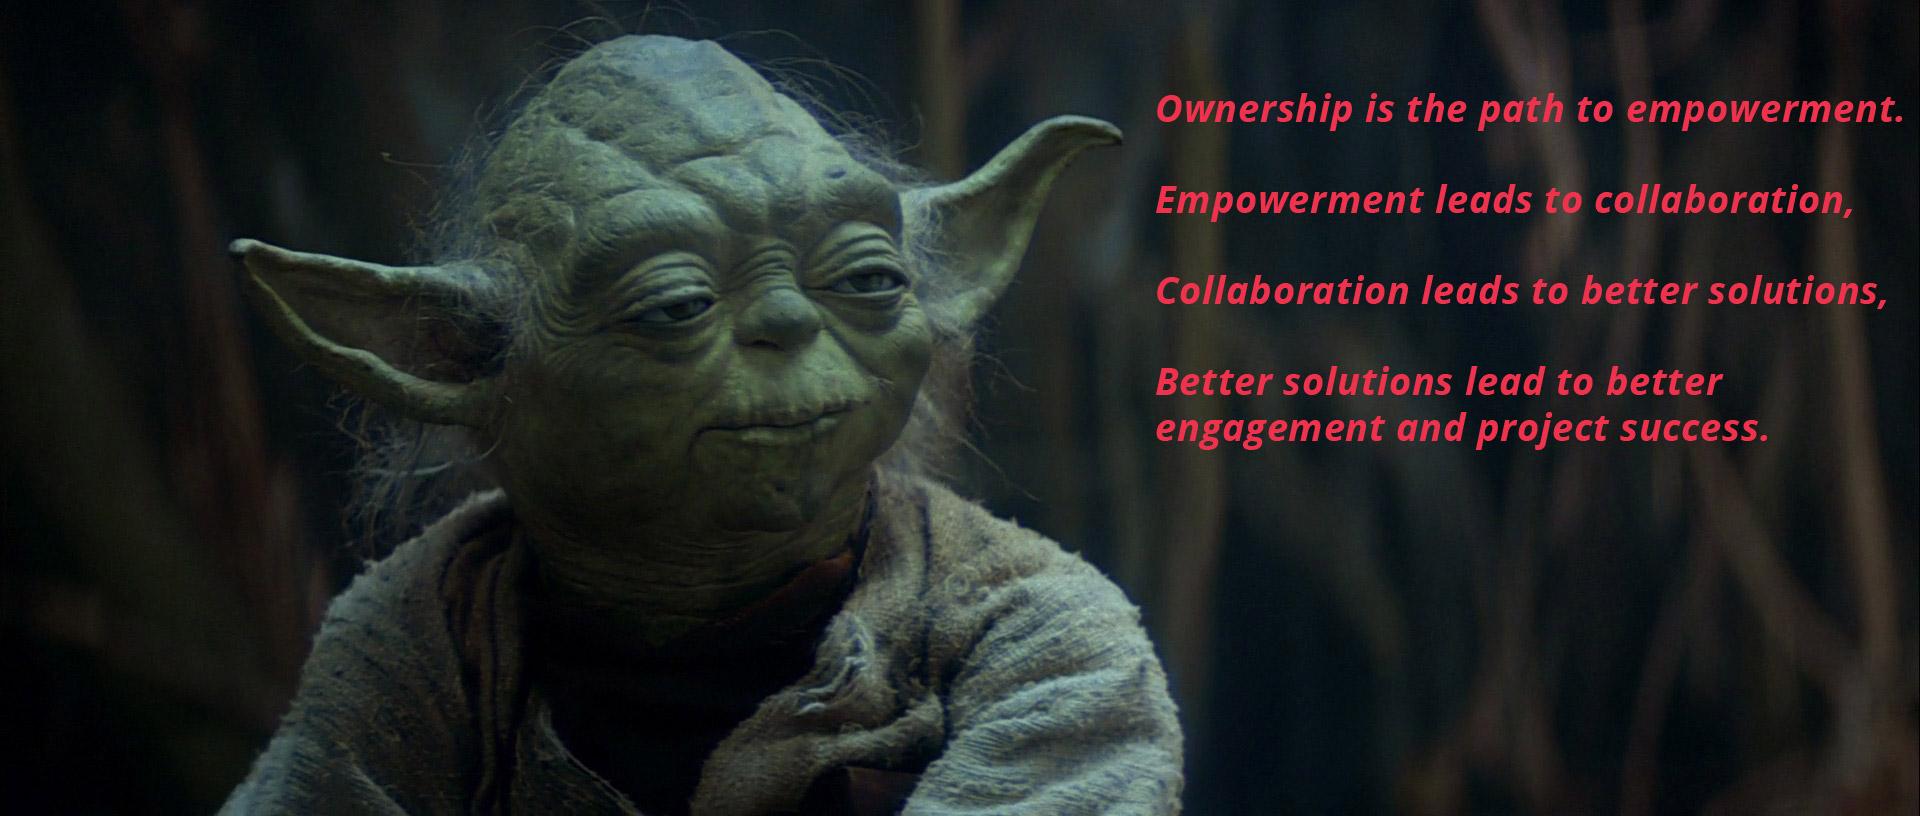 Blog-Image-Ownership-Yoda2